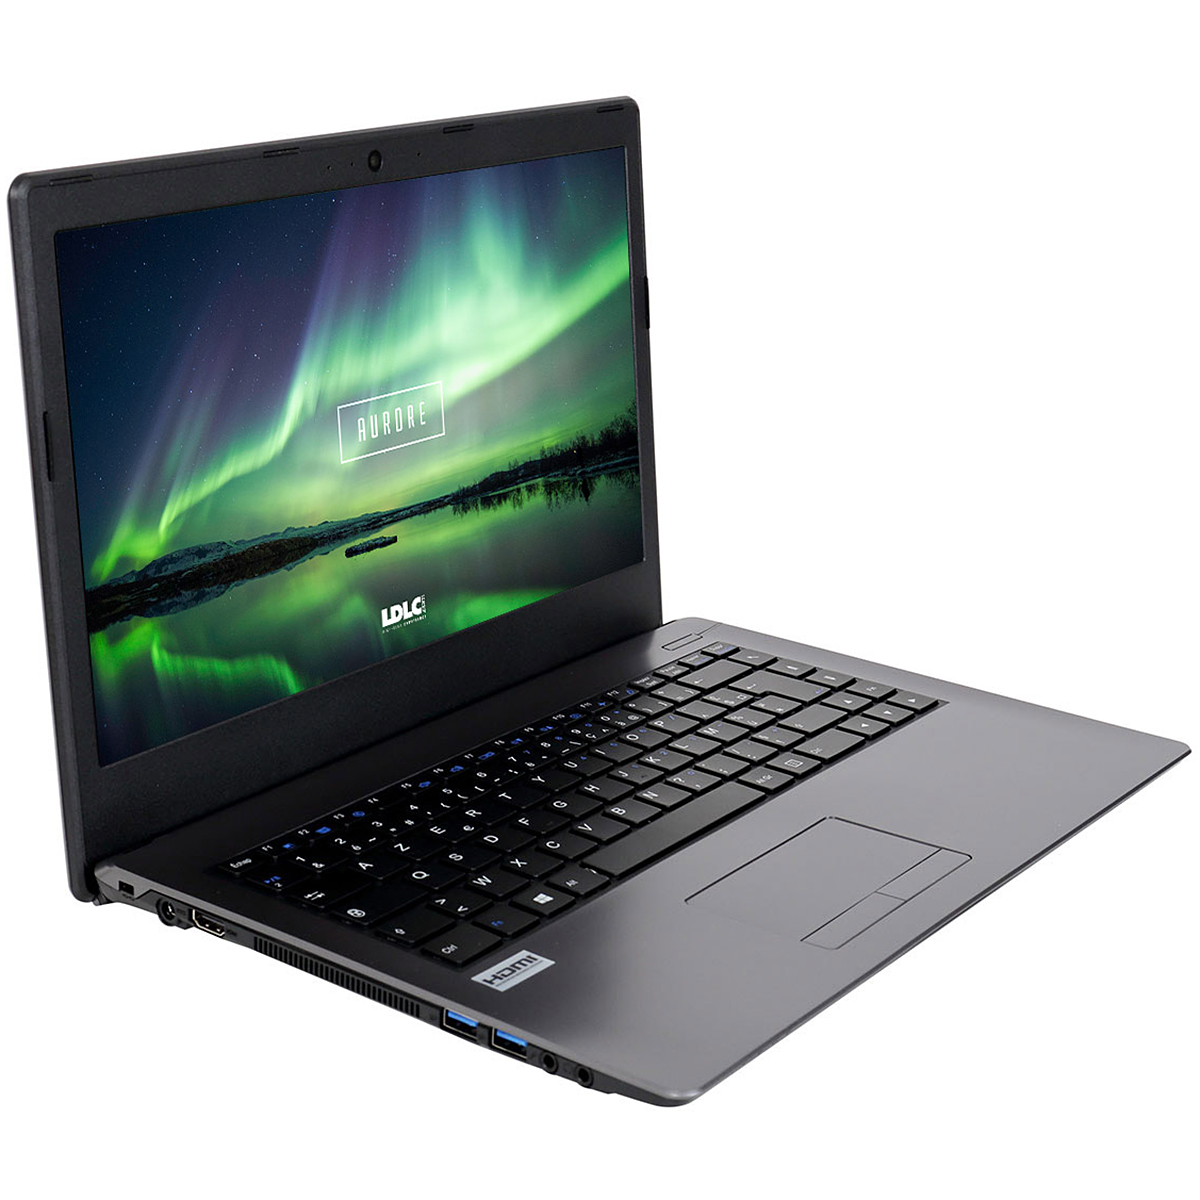 "PC portable LDLC Aurore PC5-4-H10 Intel Pentium 4405U 4 Go 1 To 14"" LED HD Wi-Fi N/Bluetooth Webcam (sans OS)"